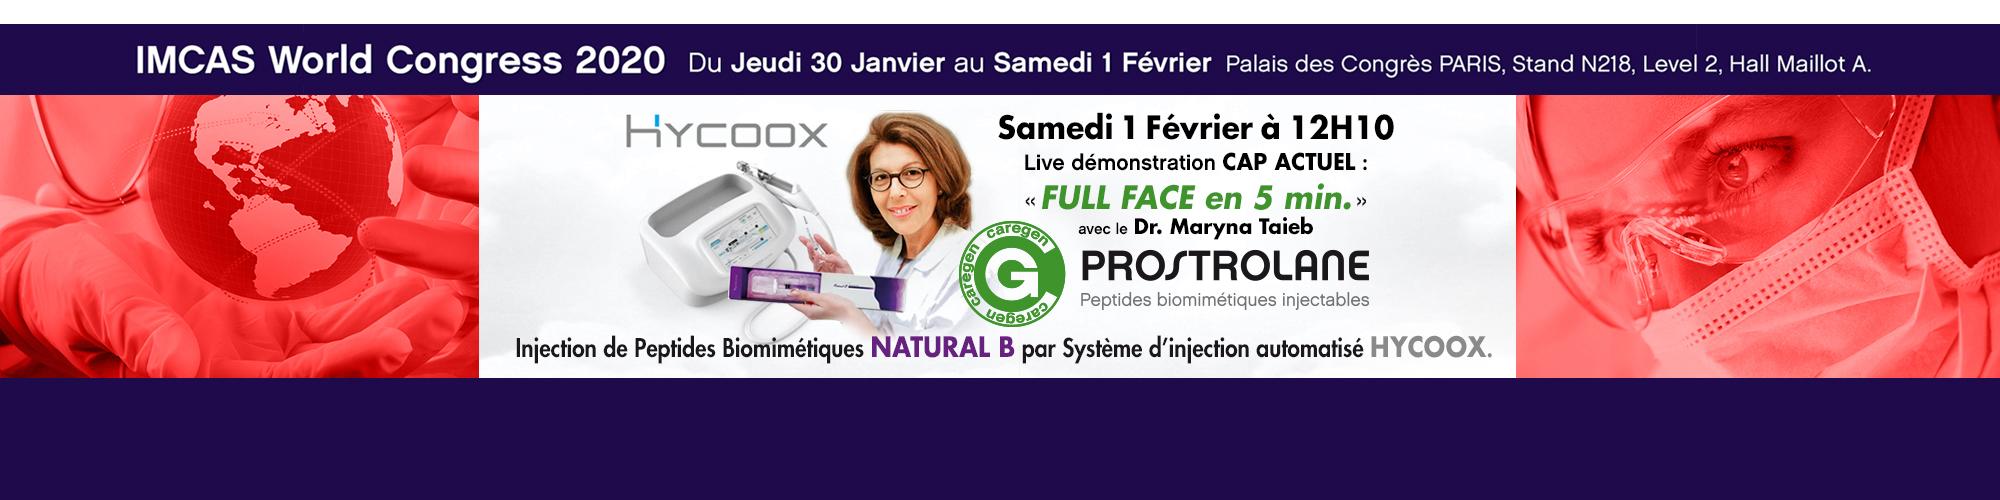 https://www.capactuel.com/storage/app/media/Carousel/cosmetique-injectacle/imcasdemocaregen.jpg